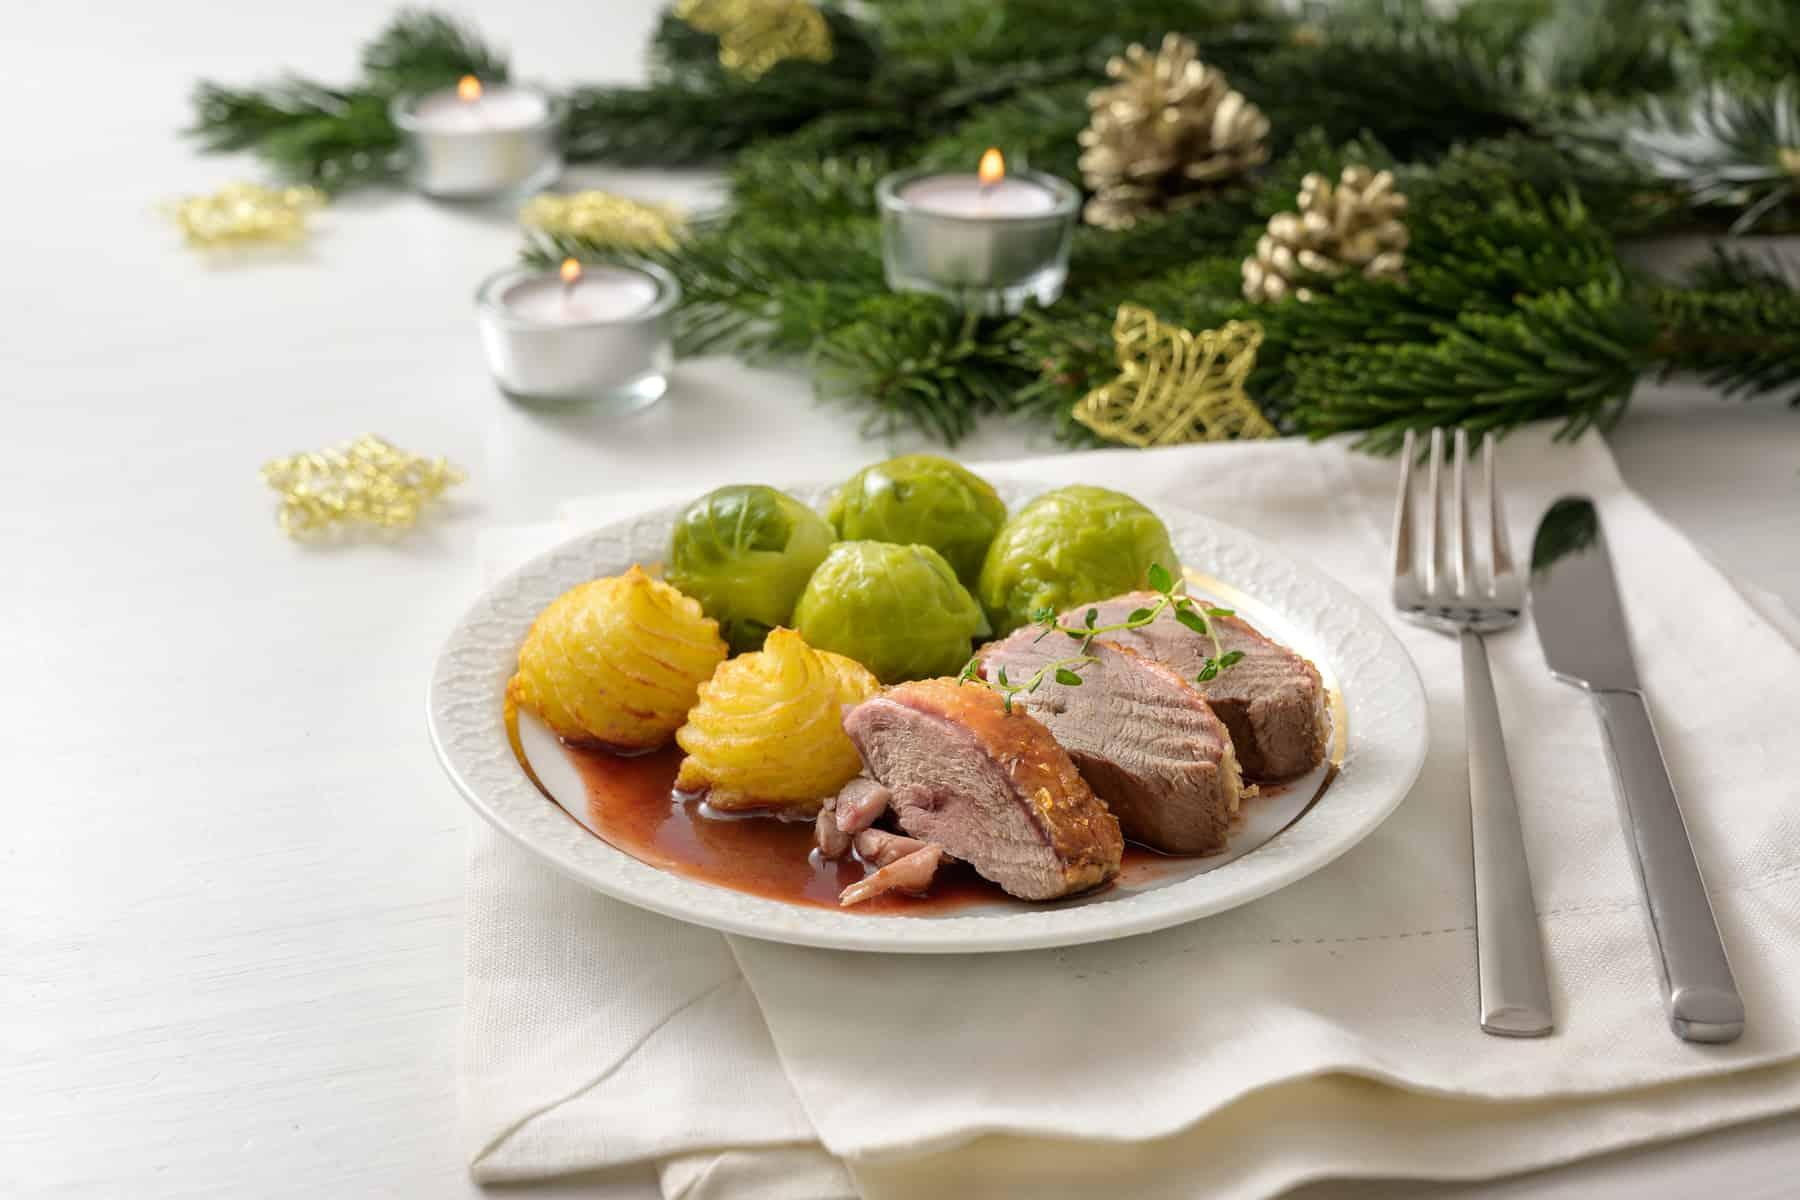 Andebryst med Duchess kartofler og rosenkål, juleret! Fransk mad